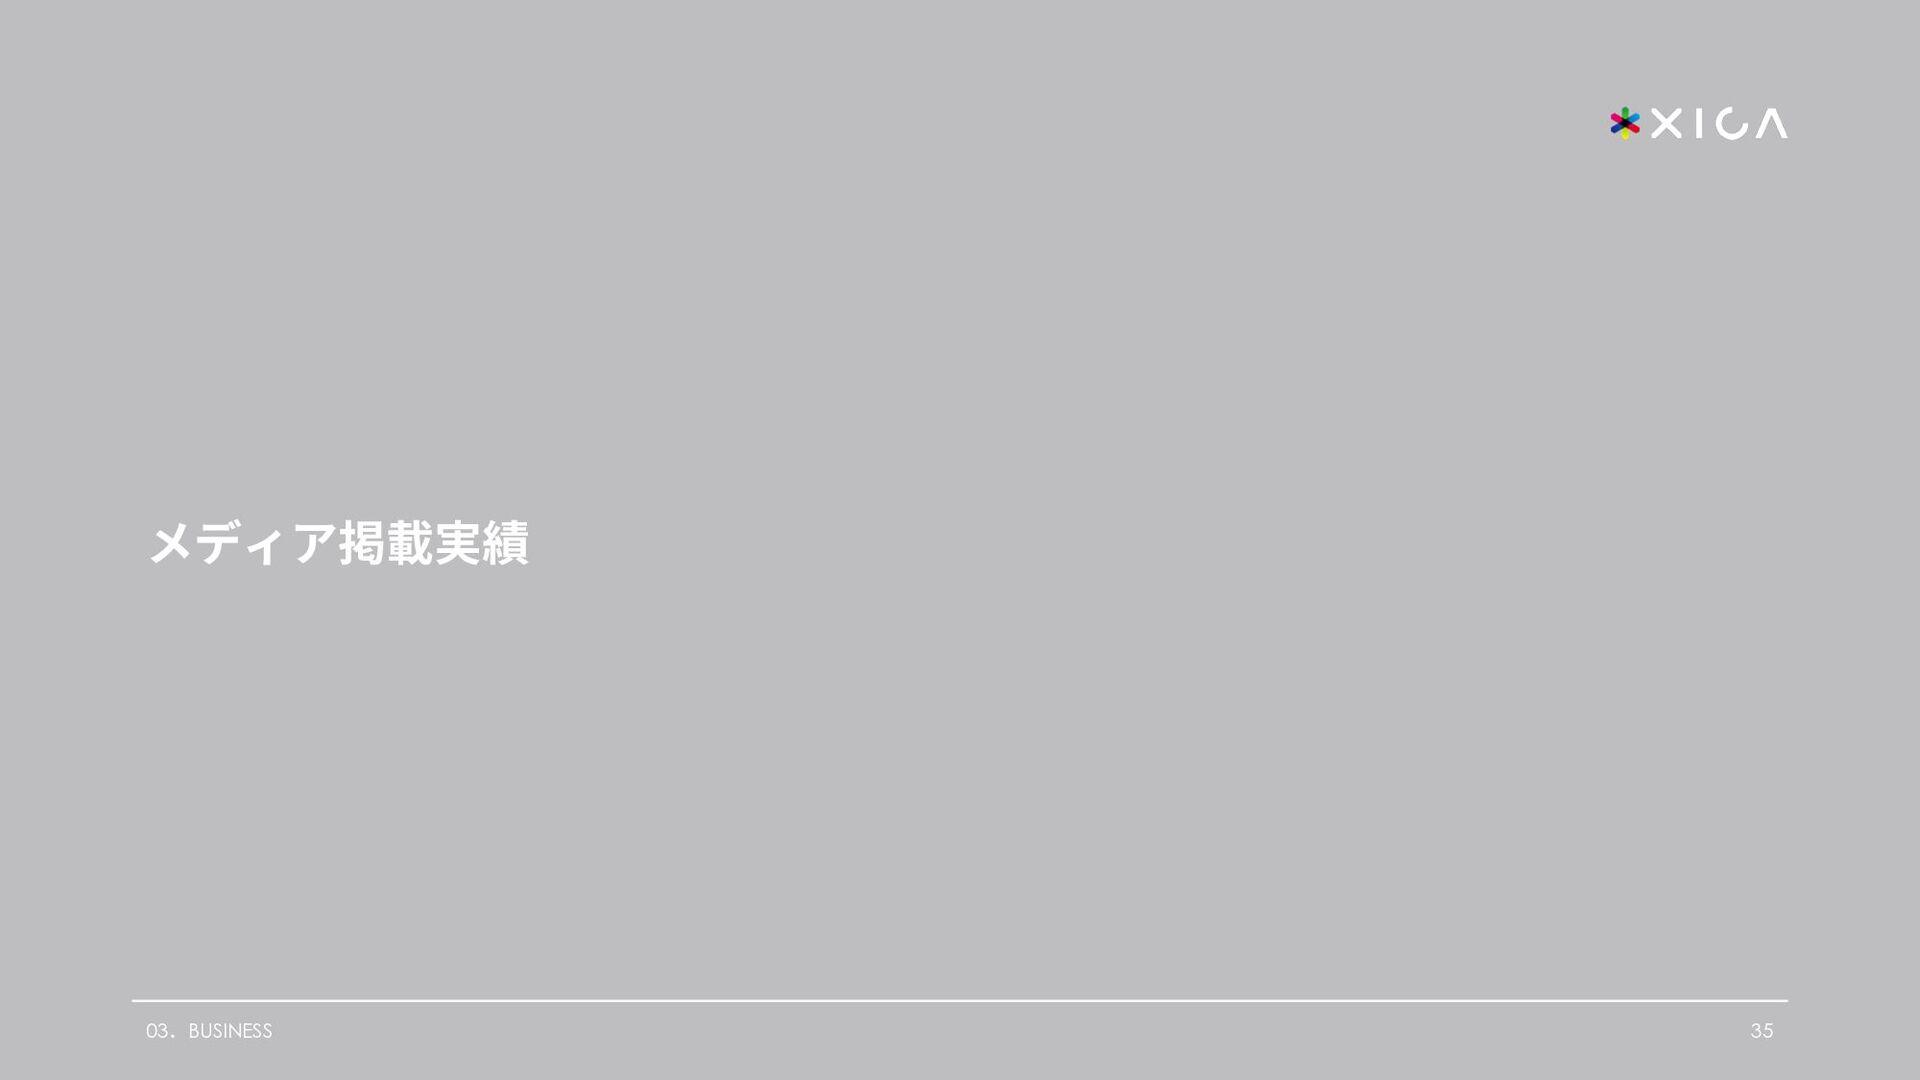 04. ORGANIZATION 35 ORGANIZATION 組織/働き⽅